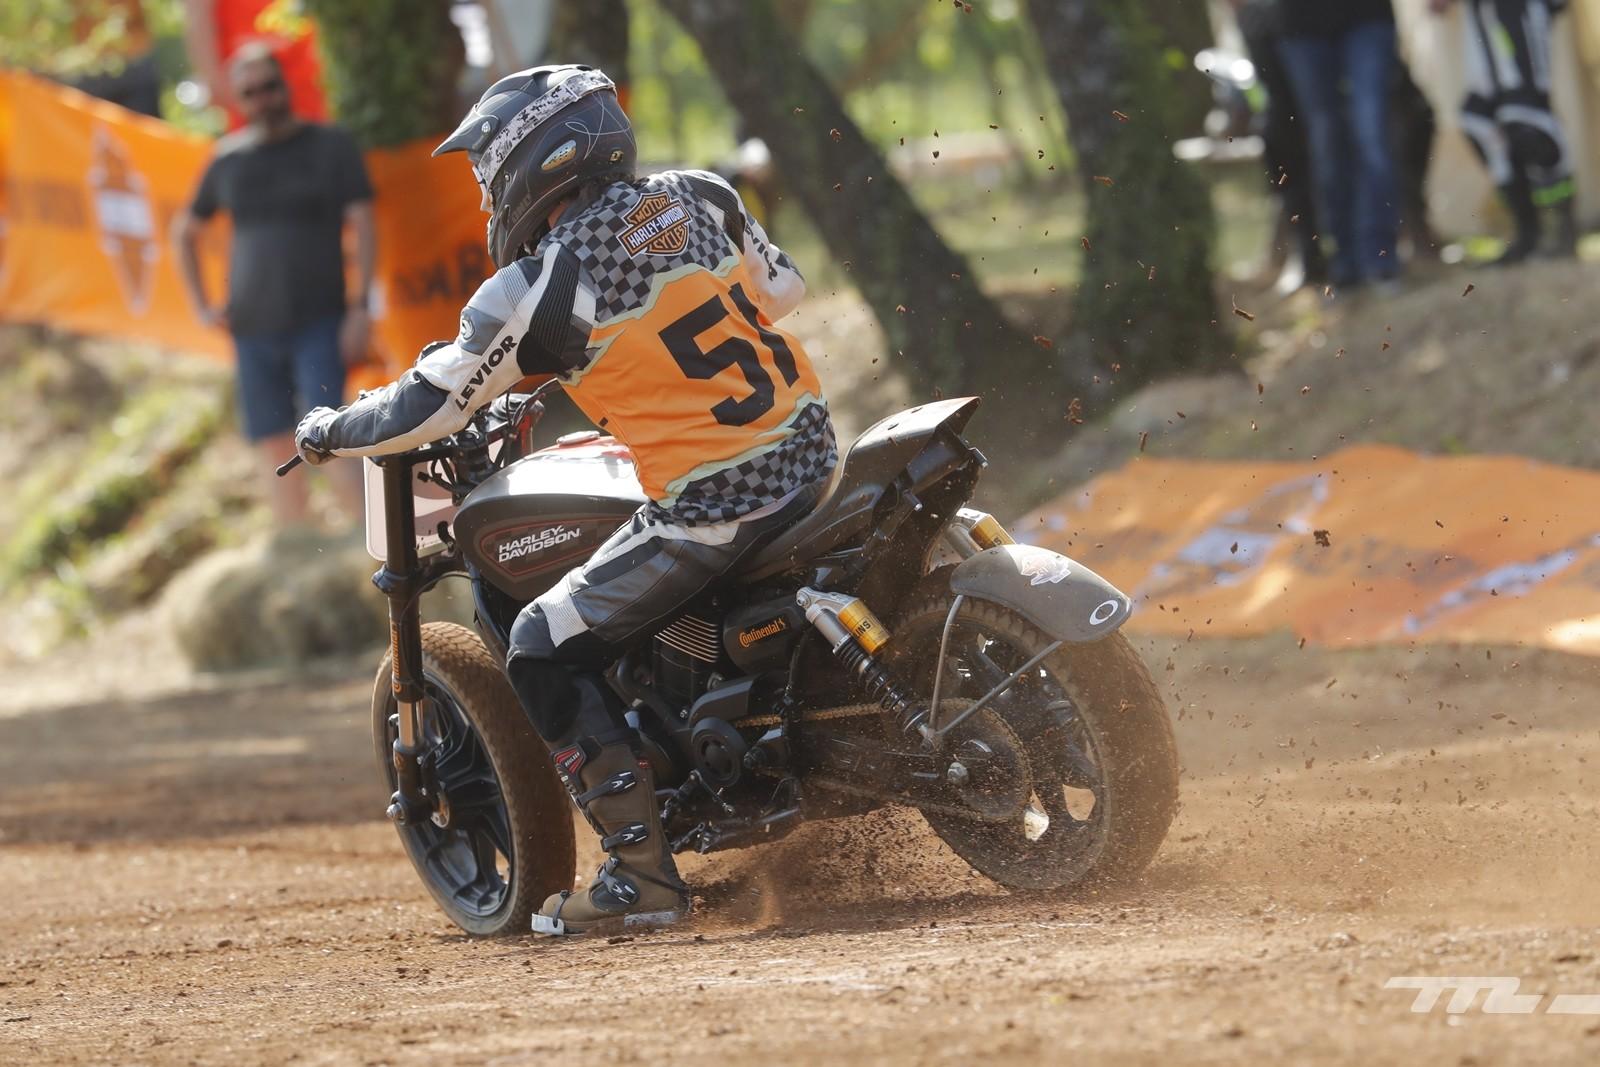 Foto de Harley-Davidson Ride Ride Slide 2018 (73/82)